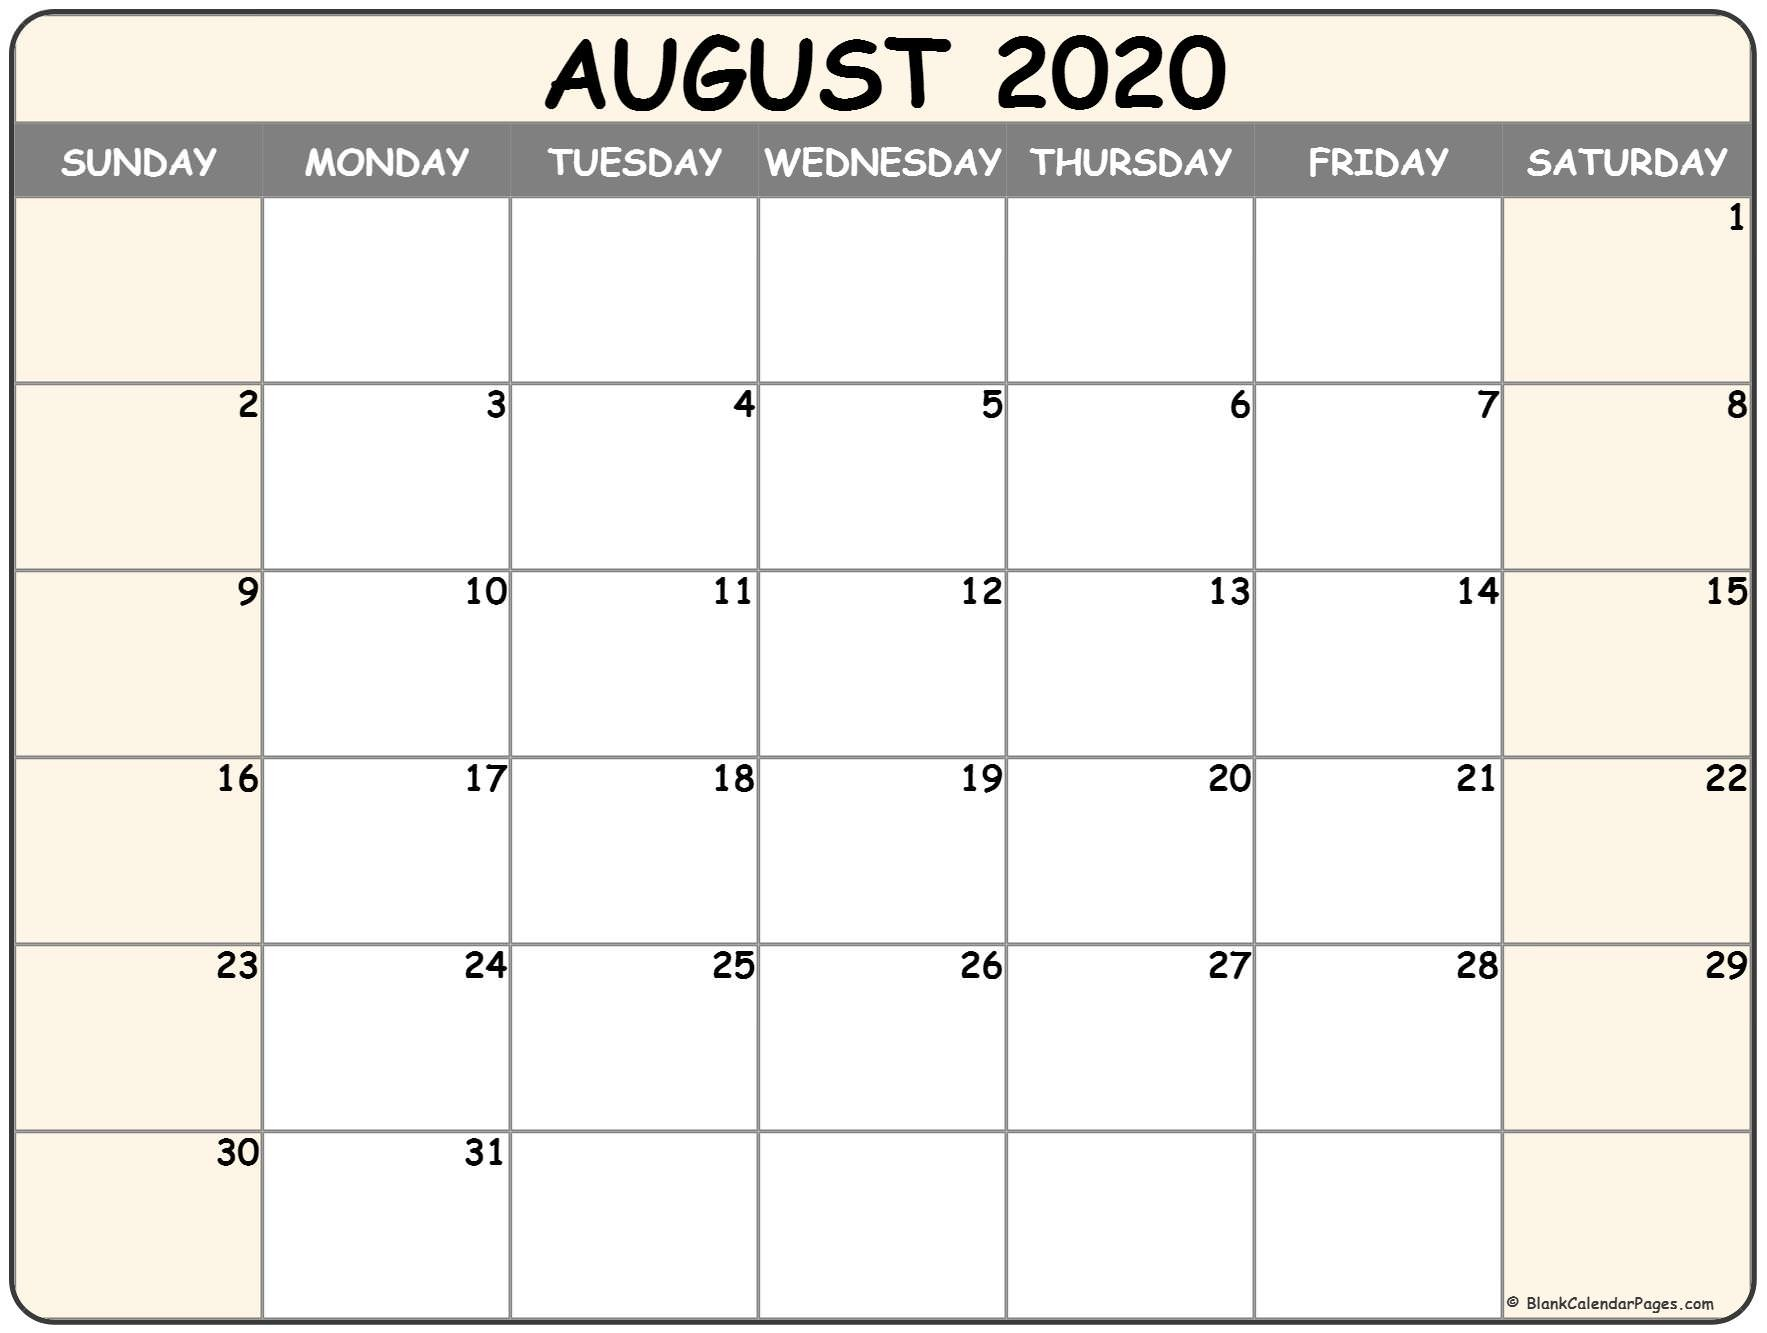 August 2020 Printable Calendar August 2020 Calendar